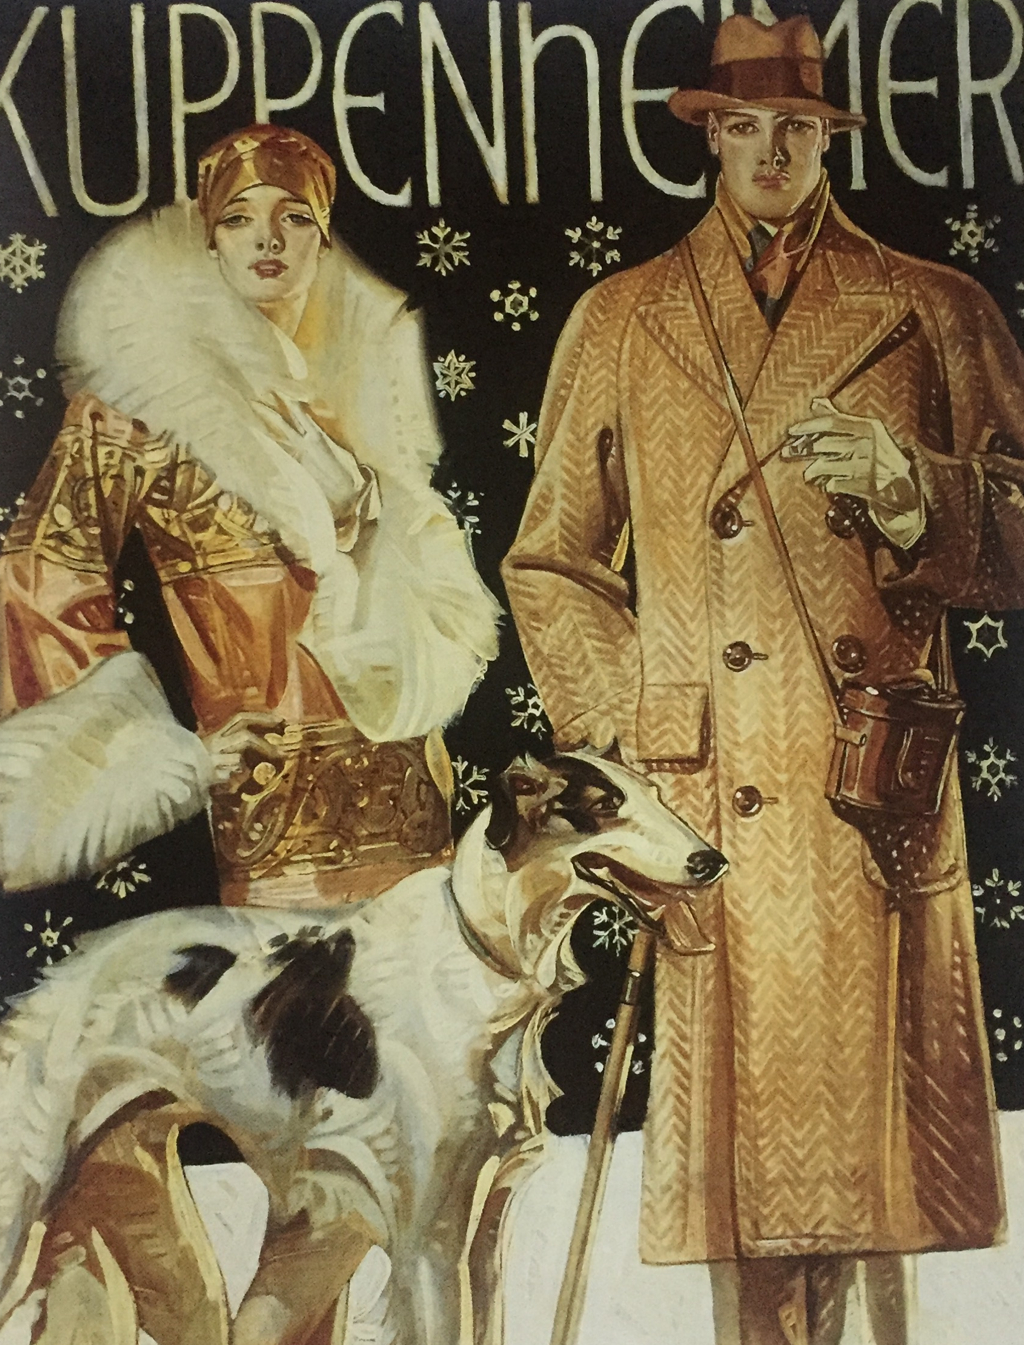 Wolfhound, Joseph Christian Leyendecker, 1874-1951